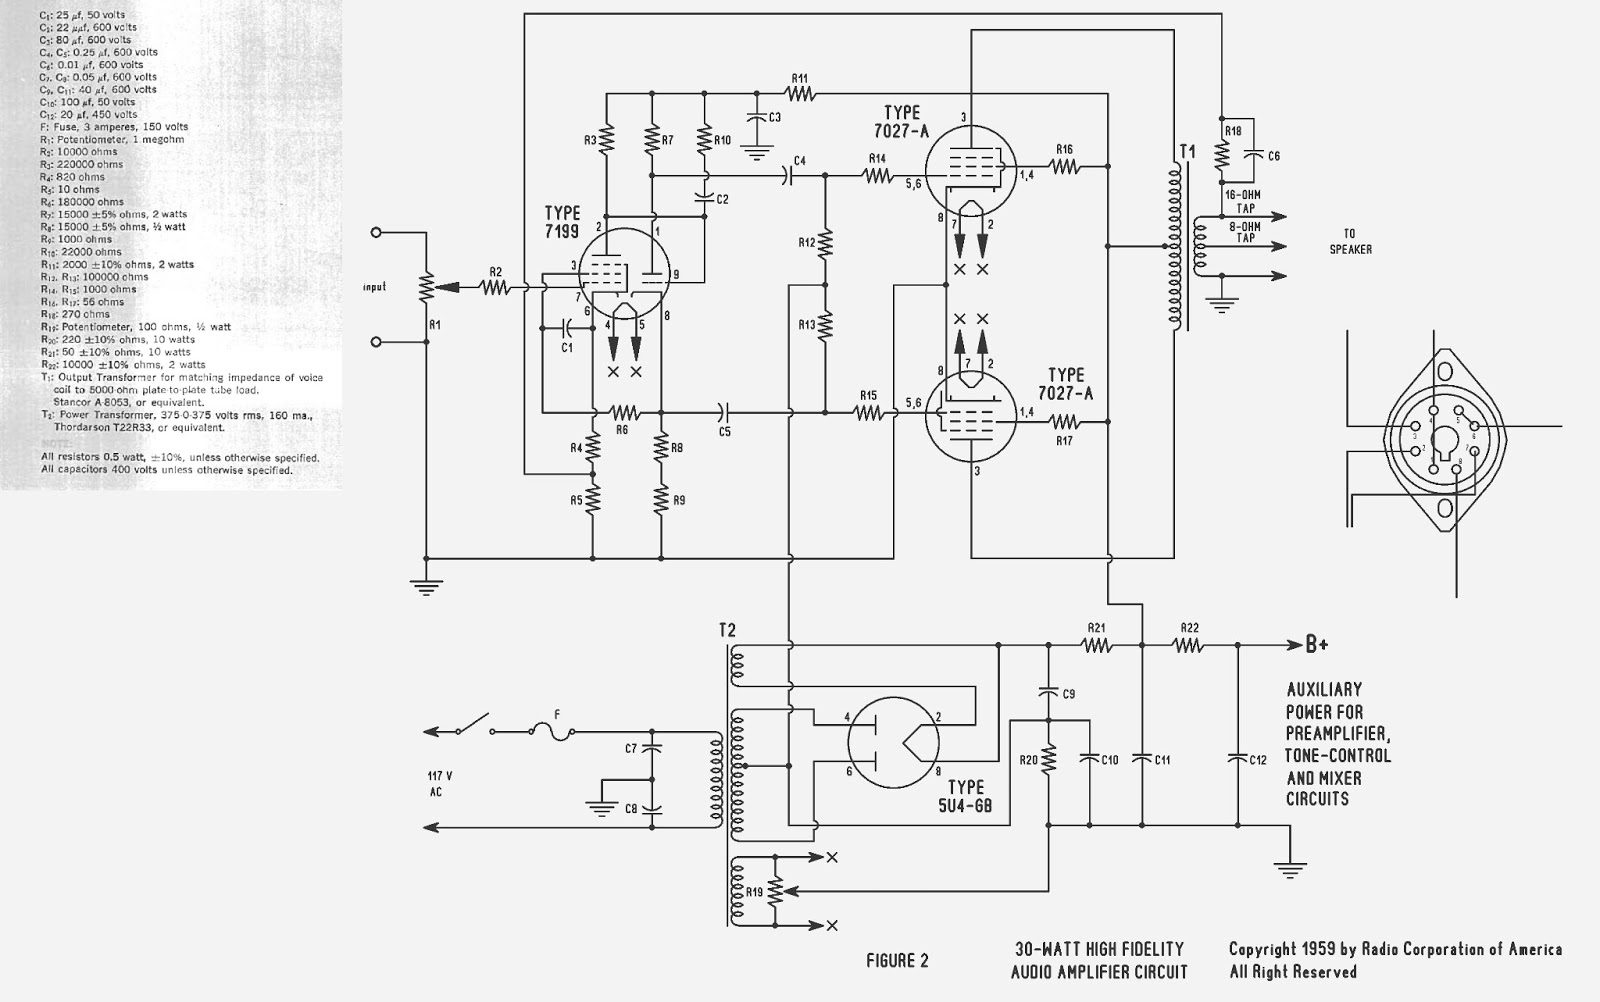 Dx Super A : 1959 RCA tube amplifier project on synthesizer schematics, antique radio schematics, zenith schematics, 4cx1500b amplifier schematics, whirlpool schematics, tube audio amplifier schematics, otl amplifier schematics, yamaha schematics, usb schematics, kitchenaid schematics, radio shack schematics, magnavox schematics, bose schematics,